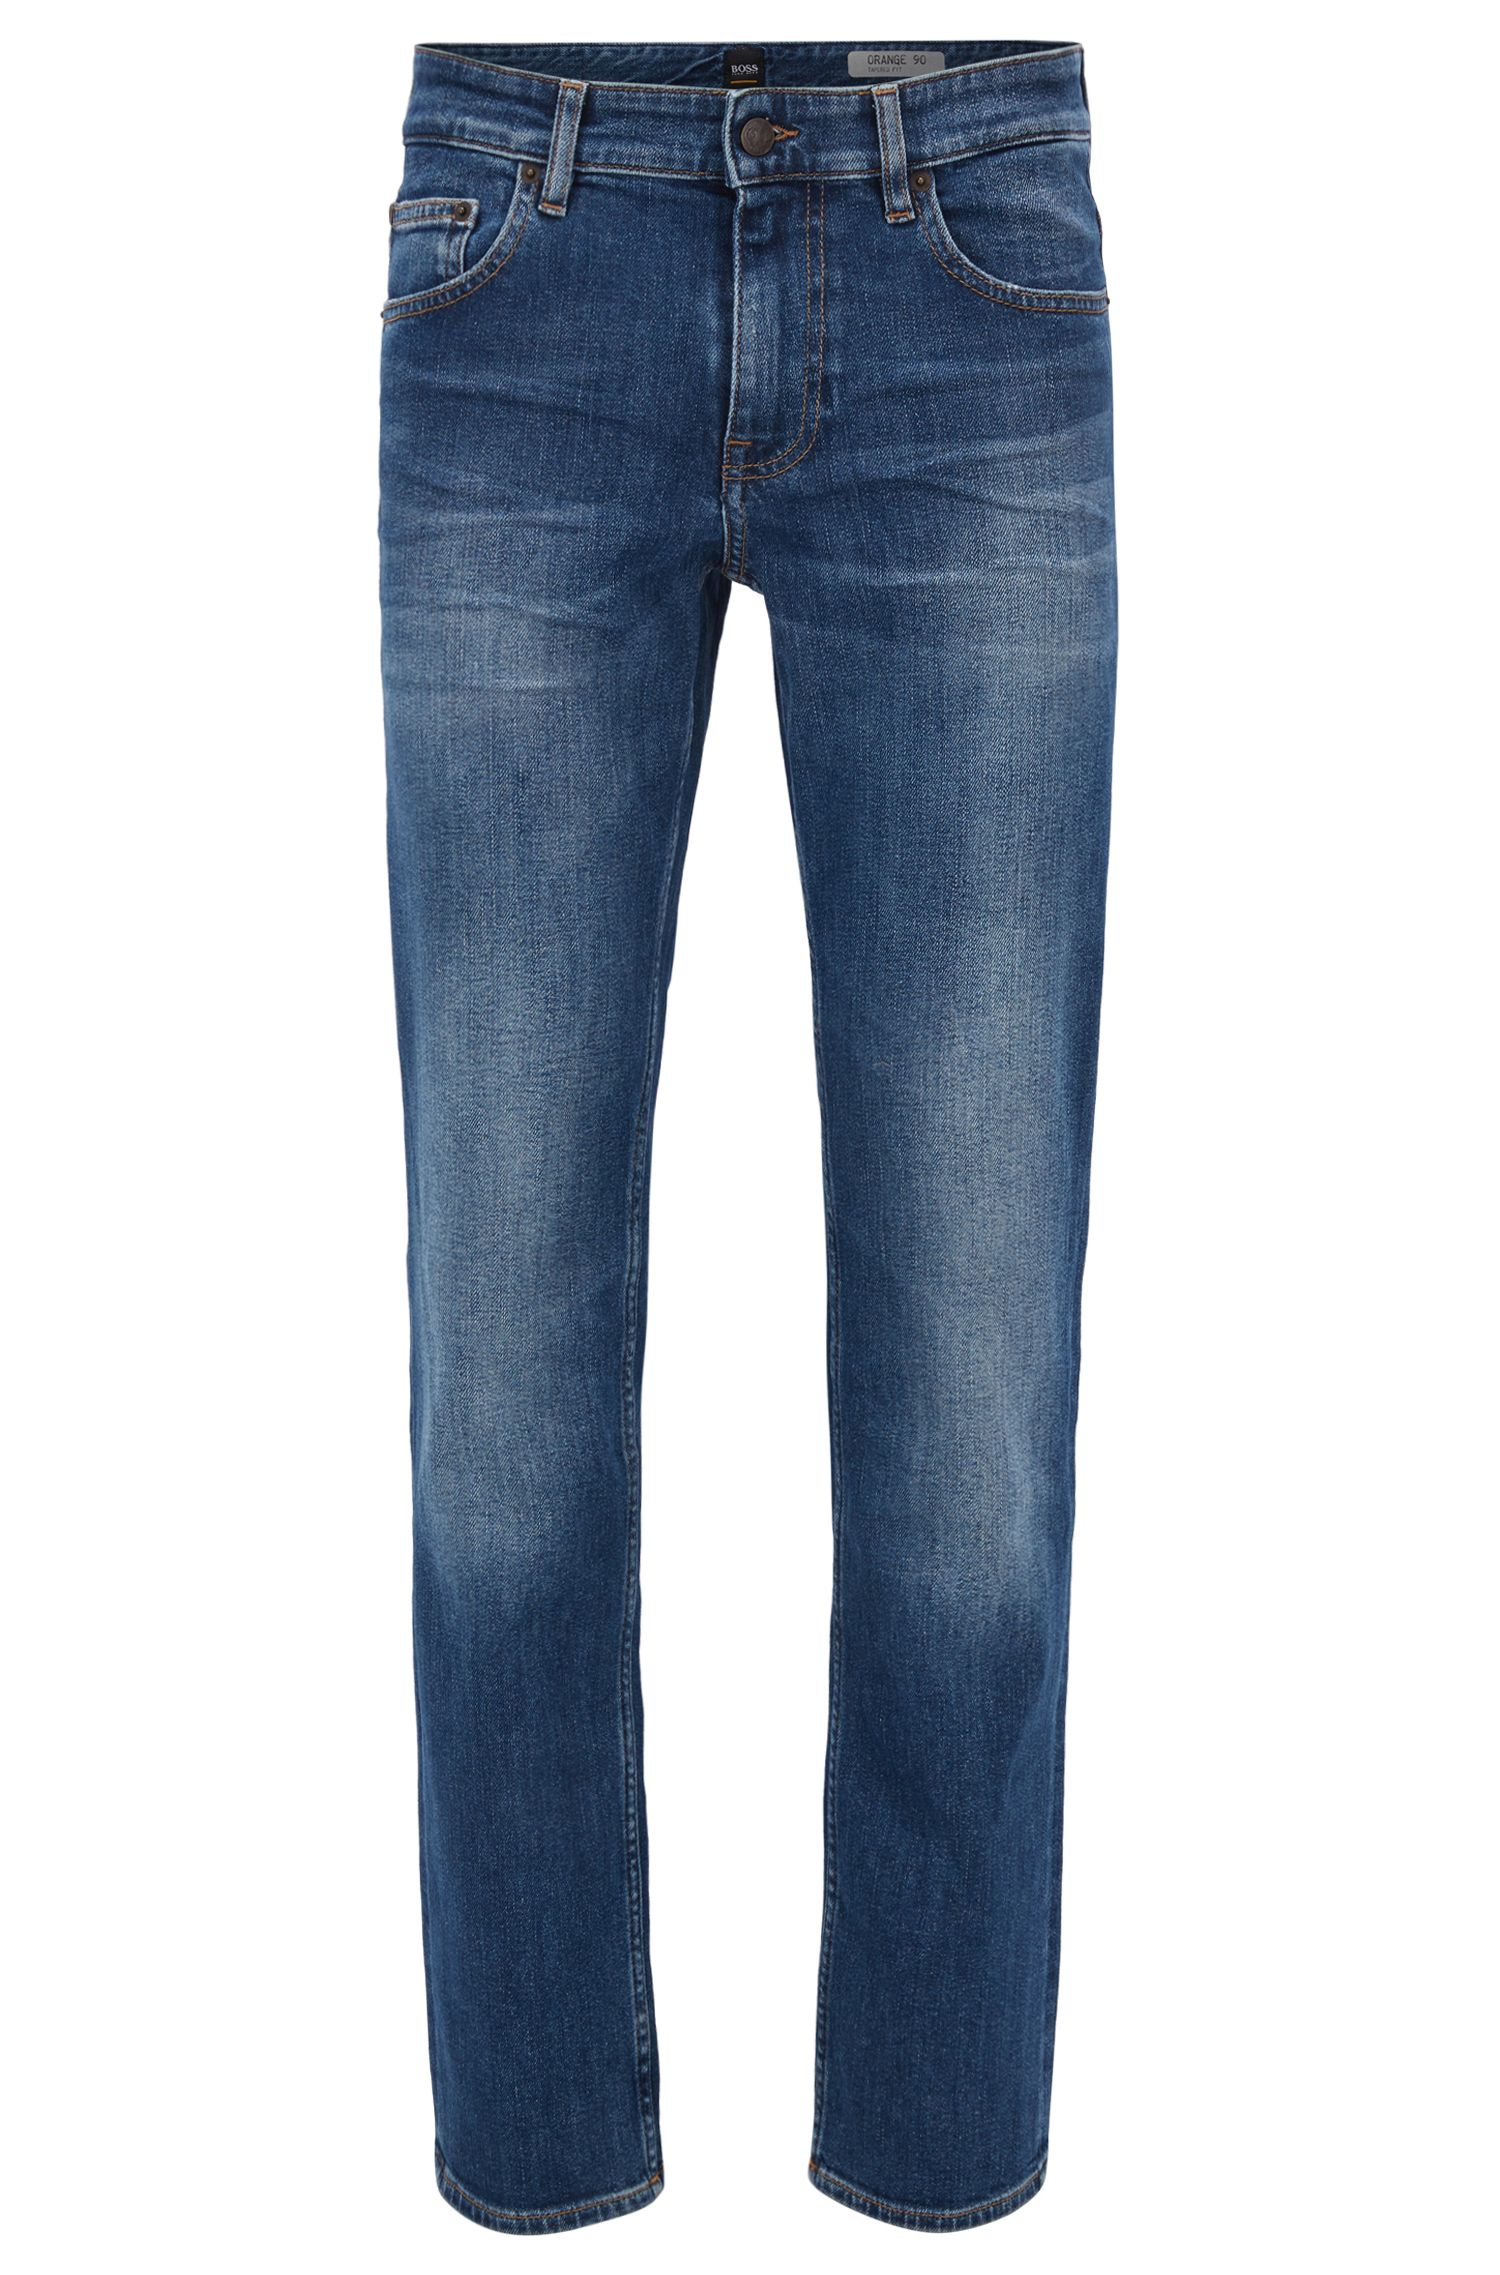 Slim-fit jeans van comfortabel, middelblauw stretchdenim